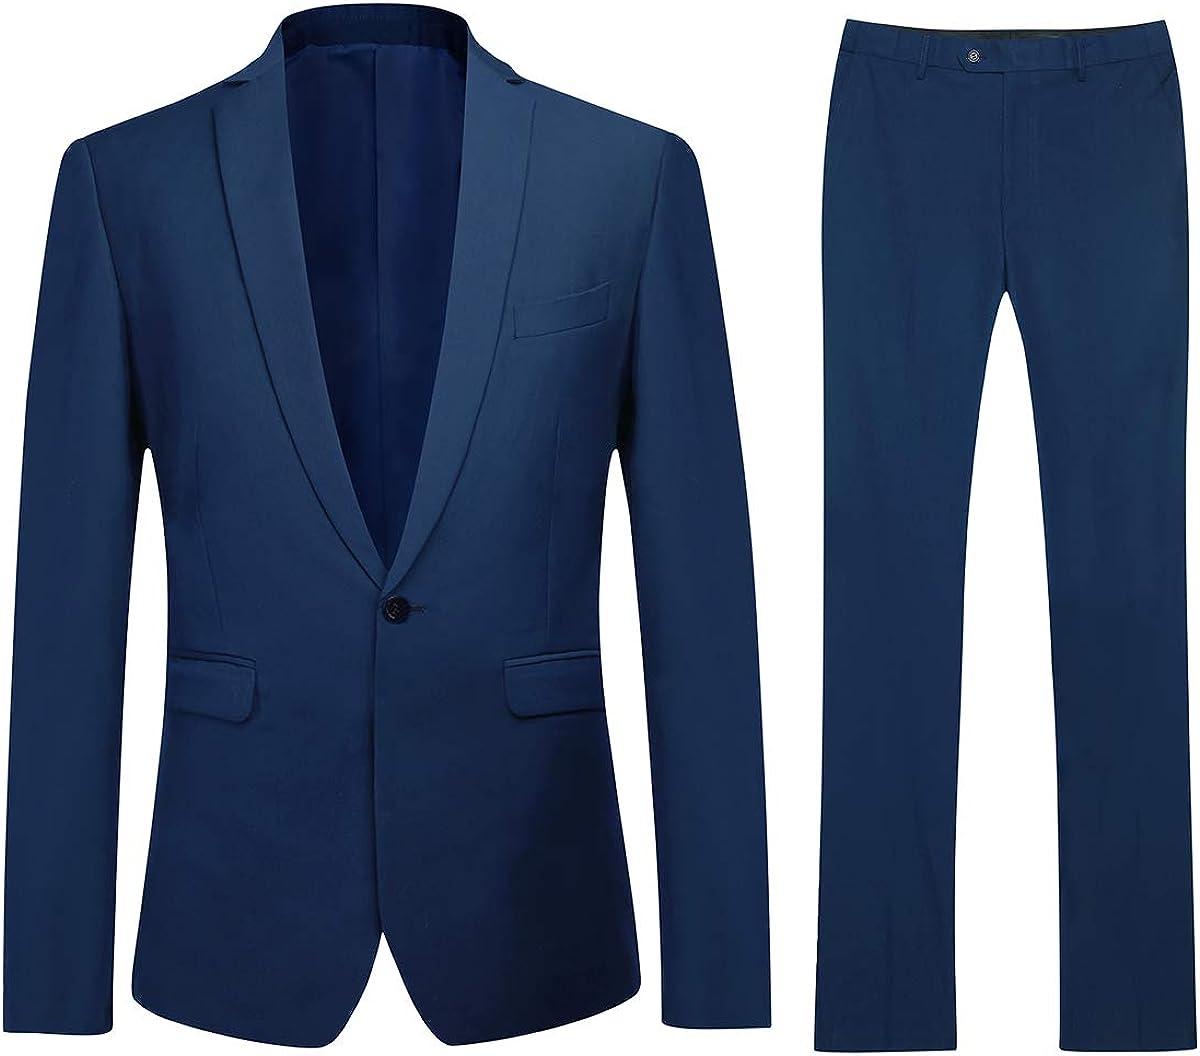 Boyland Mens 2 Piece Elegant Suits Jacket Slim Fit Notch Lapel One Button Single Breasted Pants Blue